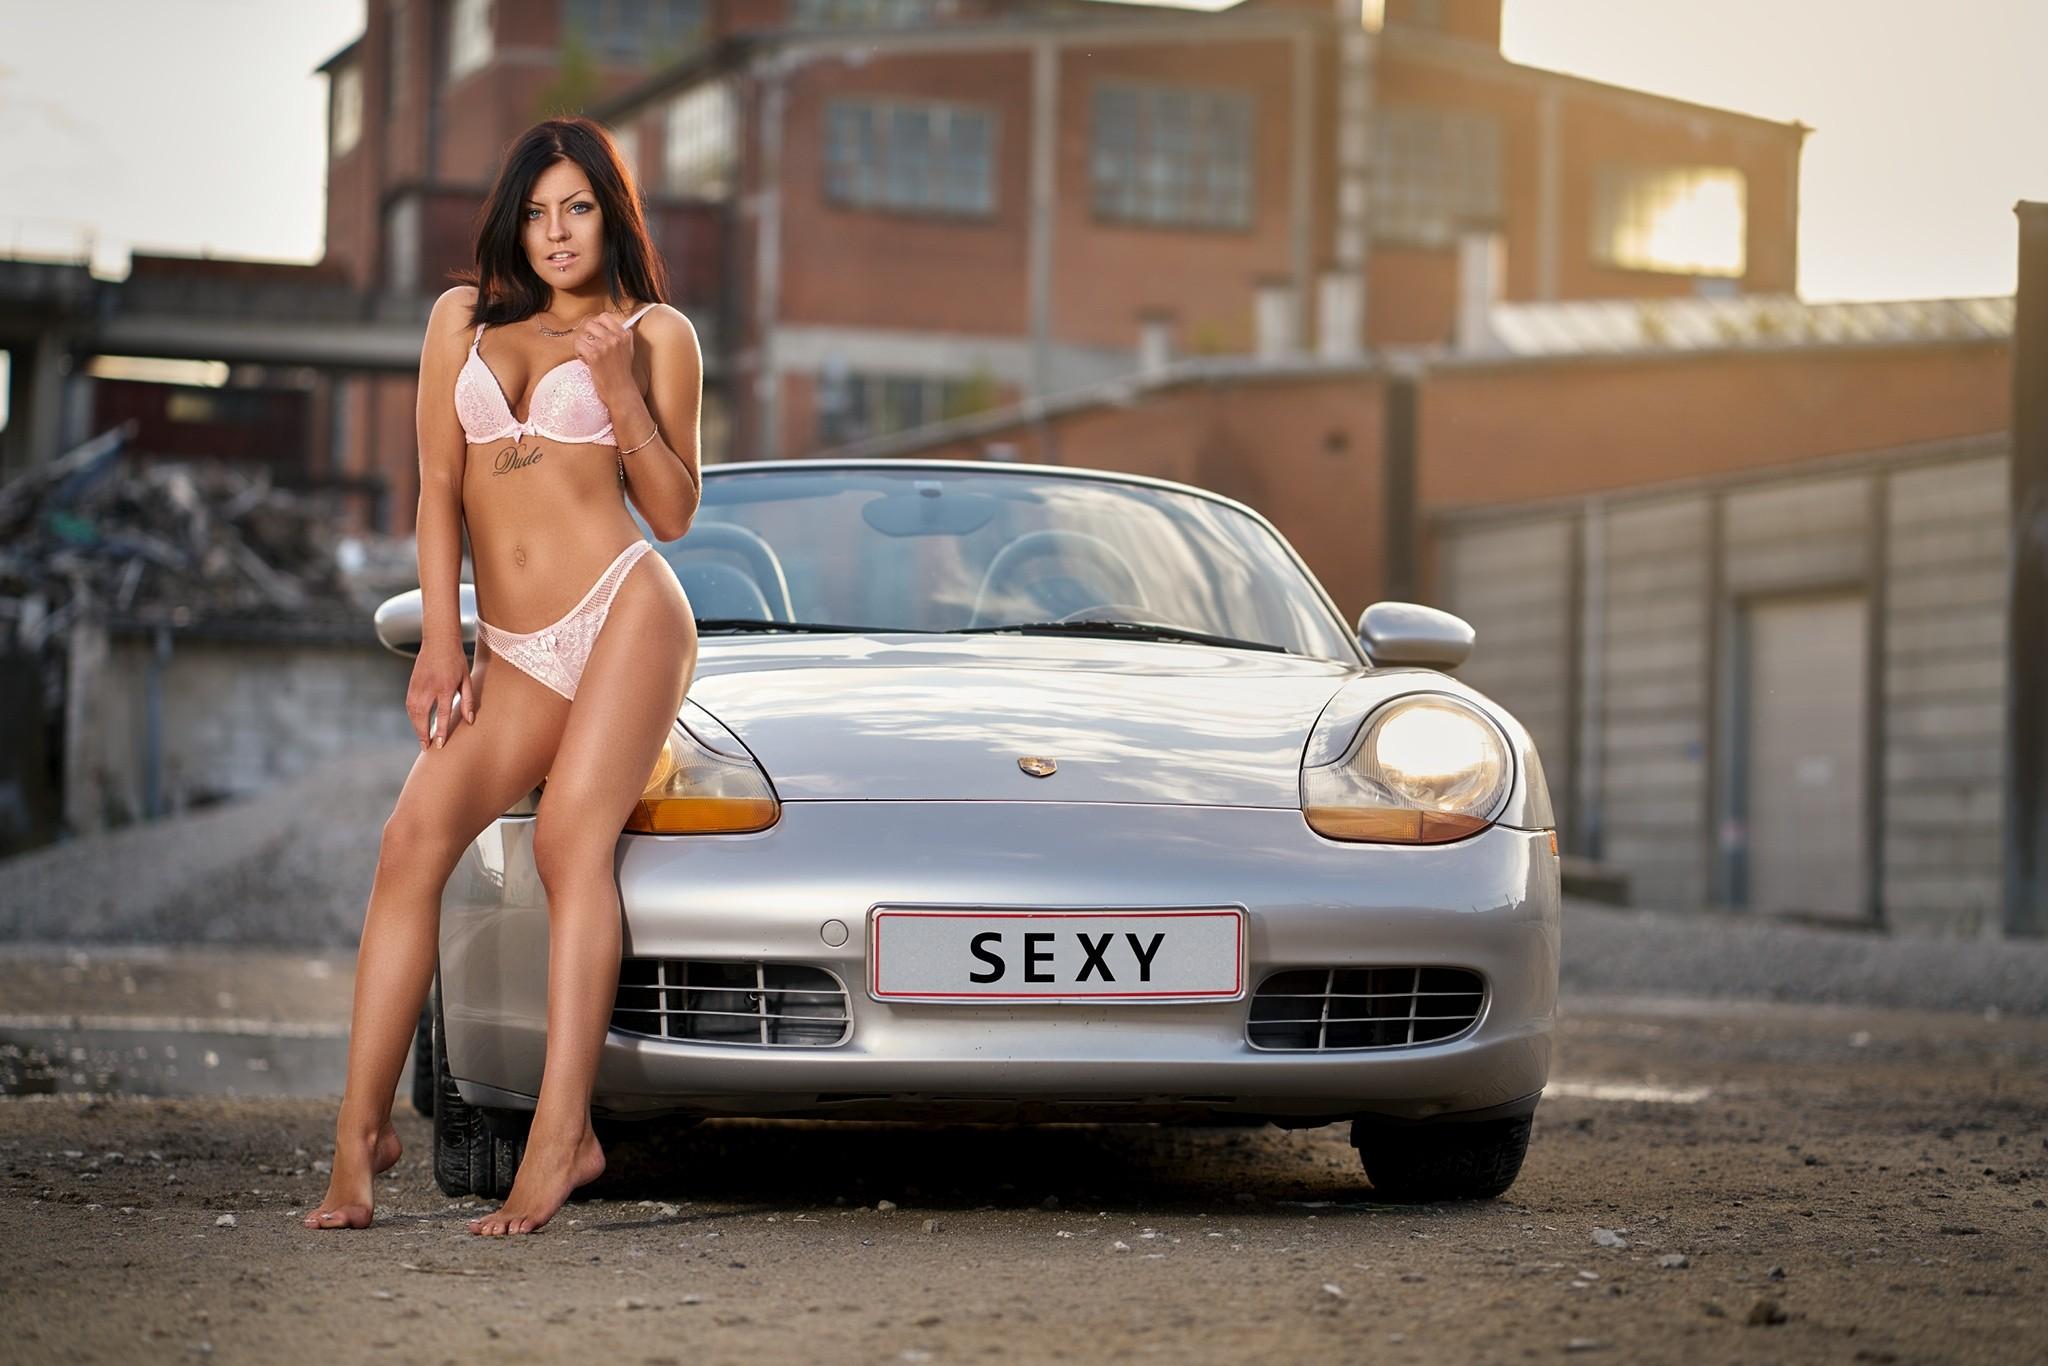 Hot Girls Fast Sexy